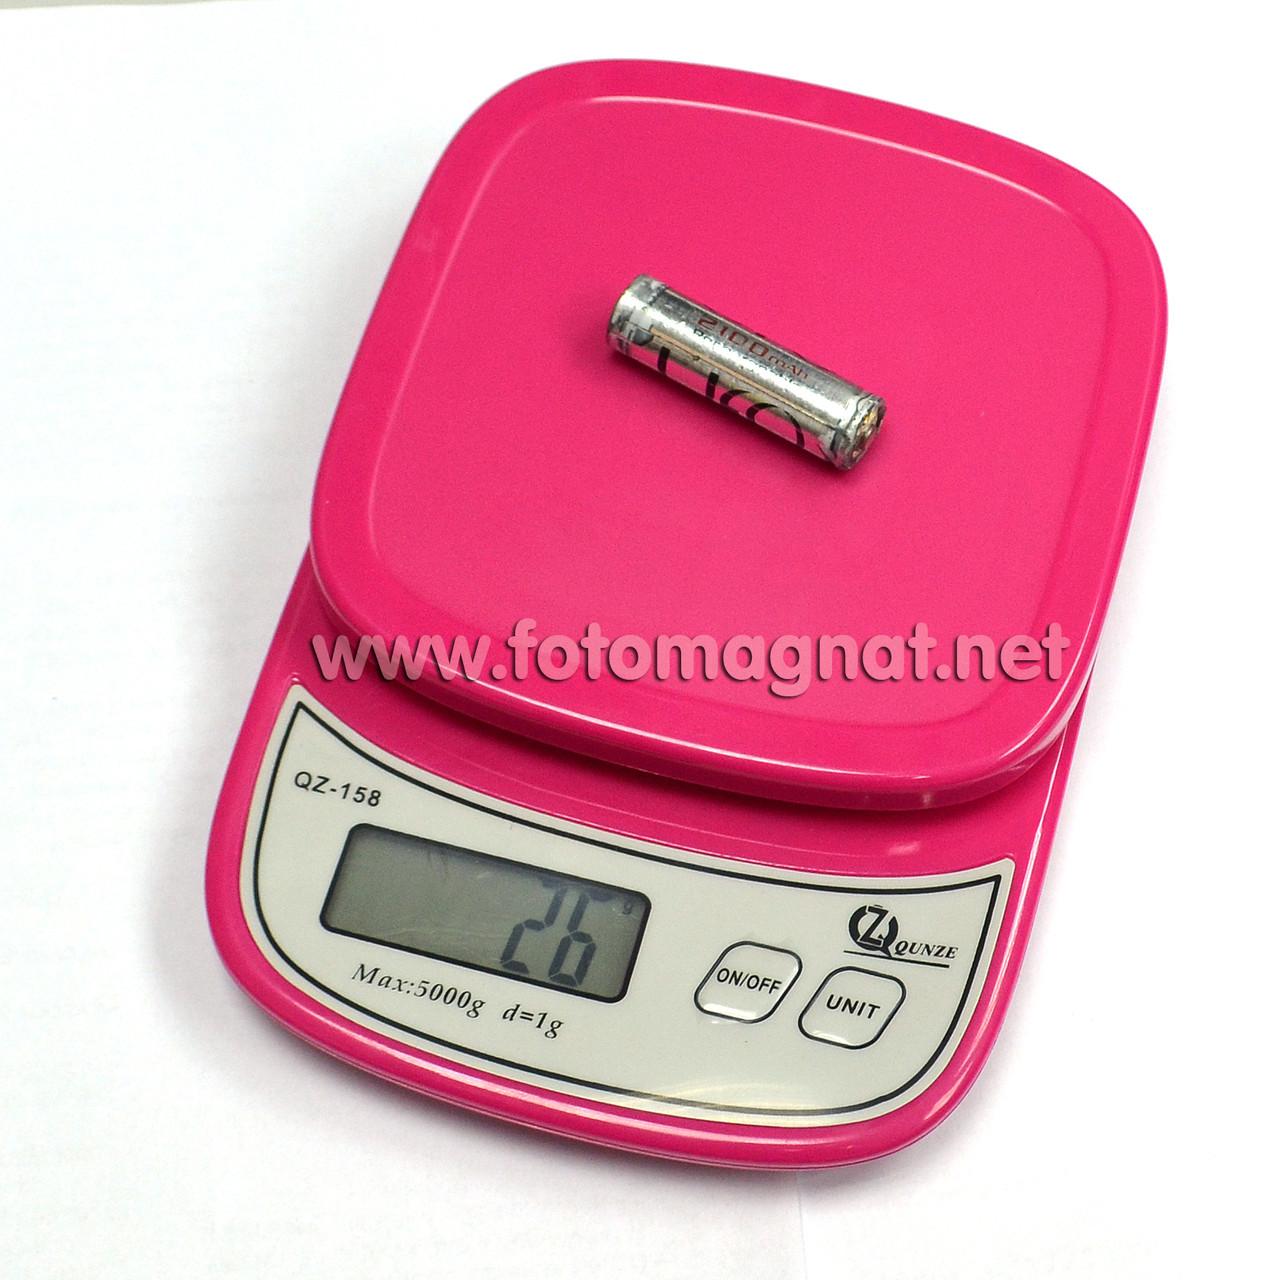 Весы кухонные электронные QZ-158, 5кг (0.5г) (электронные весы)